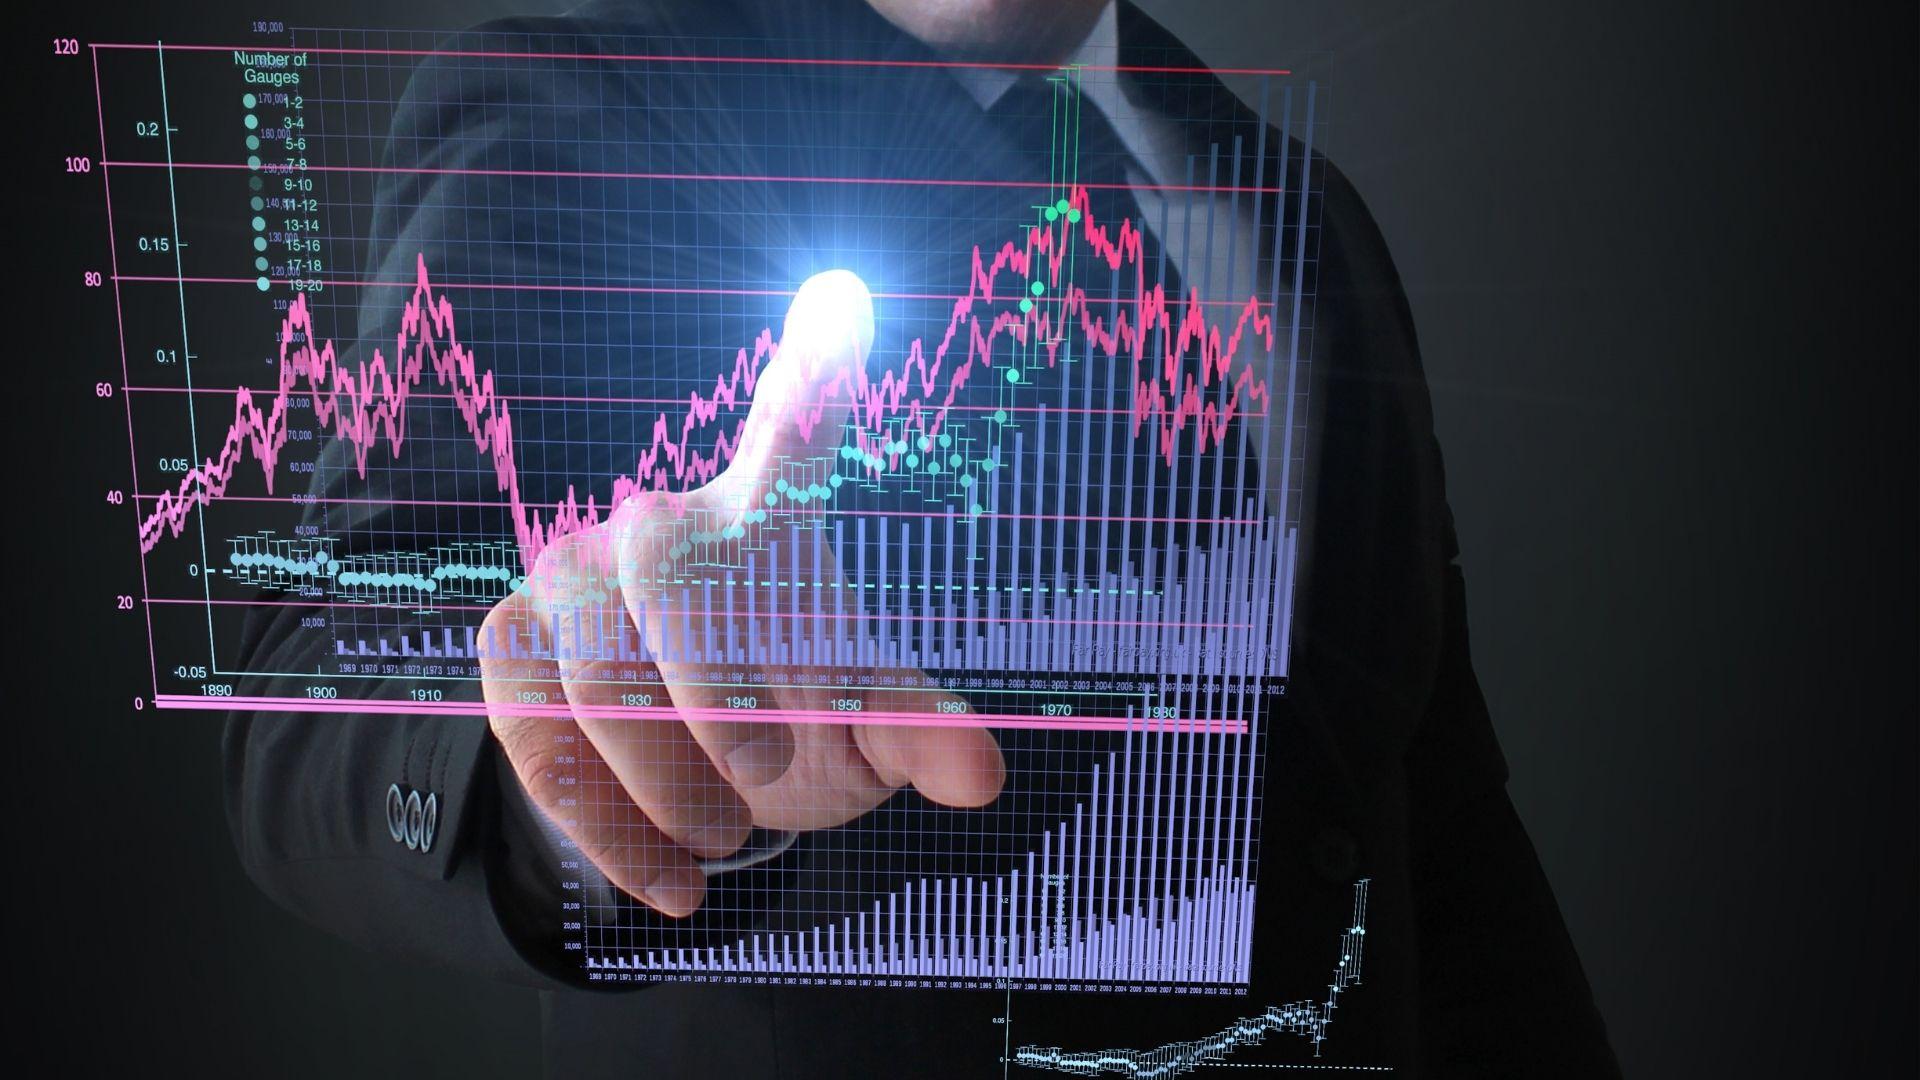 Digital Finance: Unlocking New Capital in Disrupted Markets 41